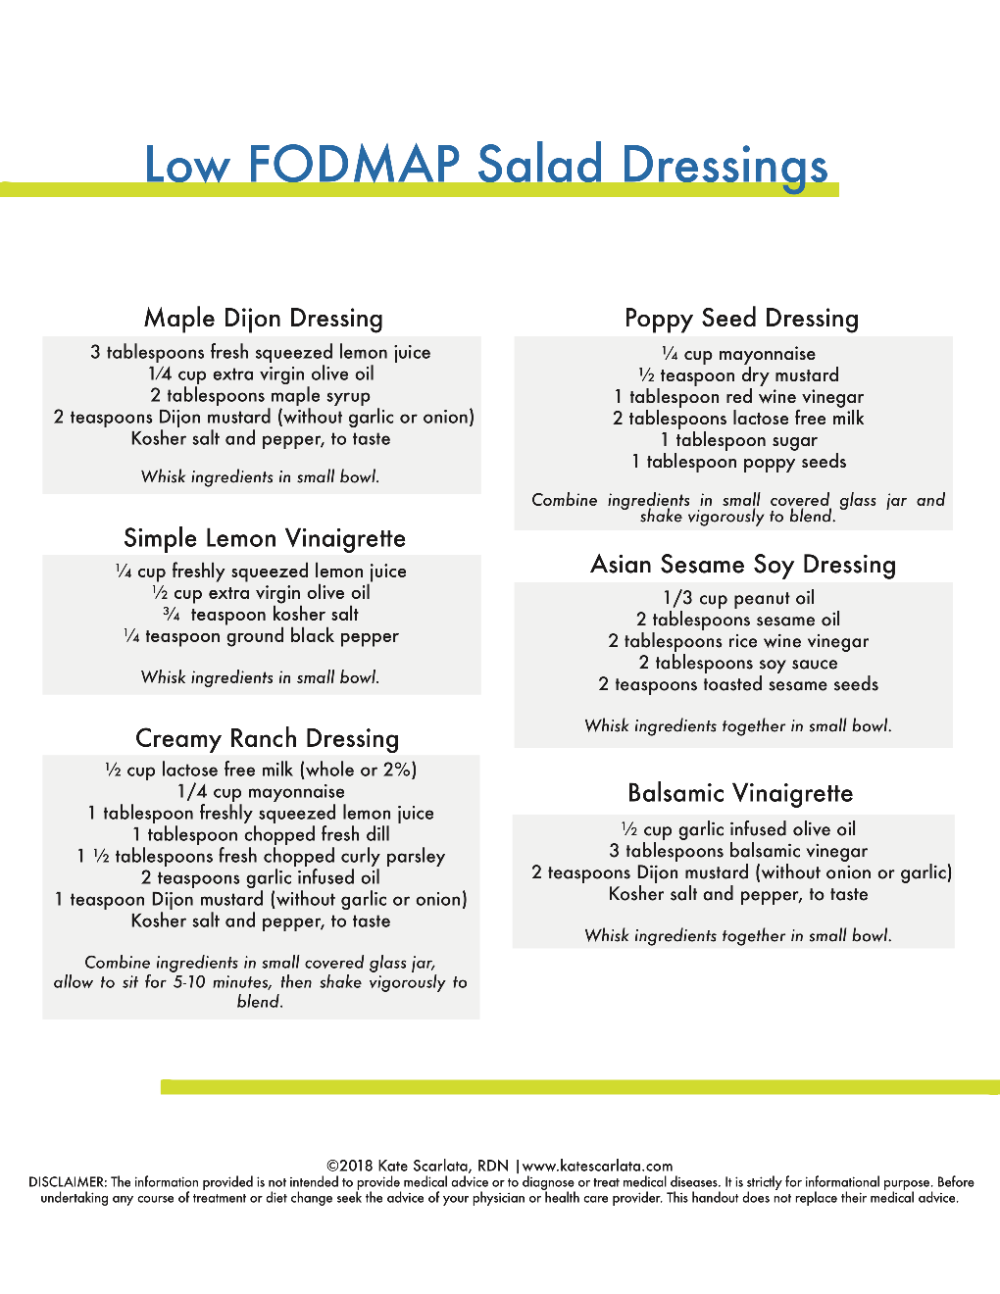 FODMAP friendly Salad Dressings